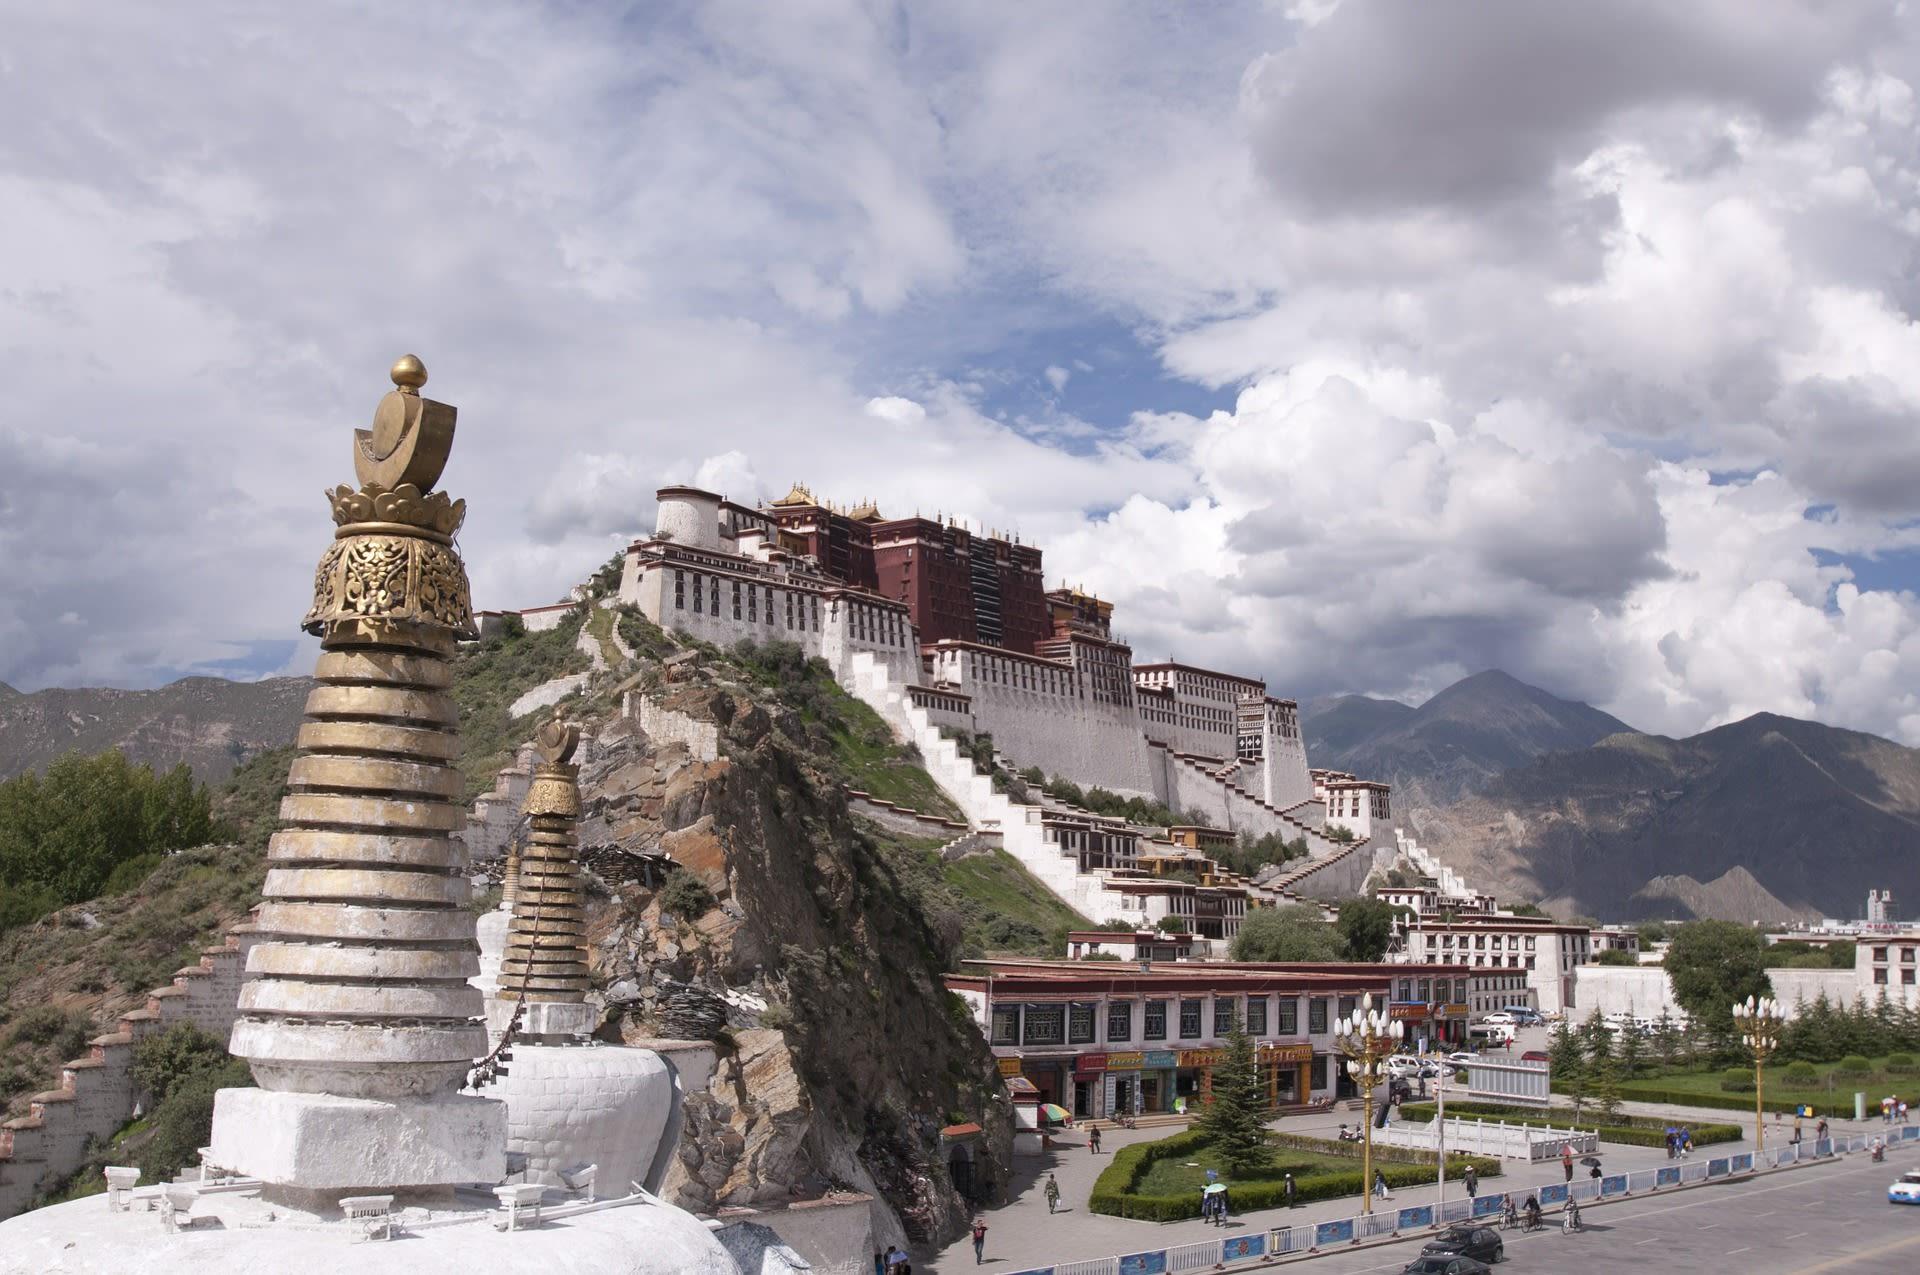 Kingdoms of the Clouds Tours 2019 - 2020 -  Potala Palace